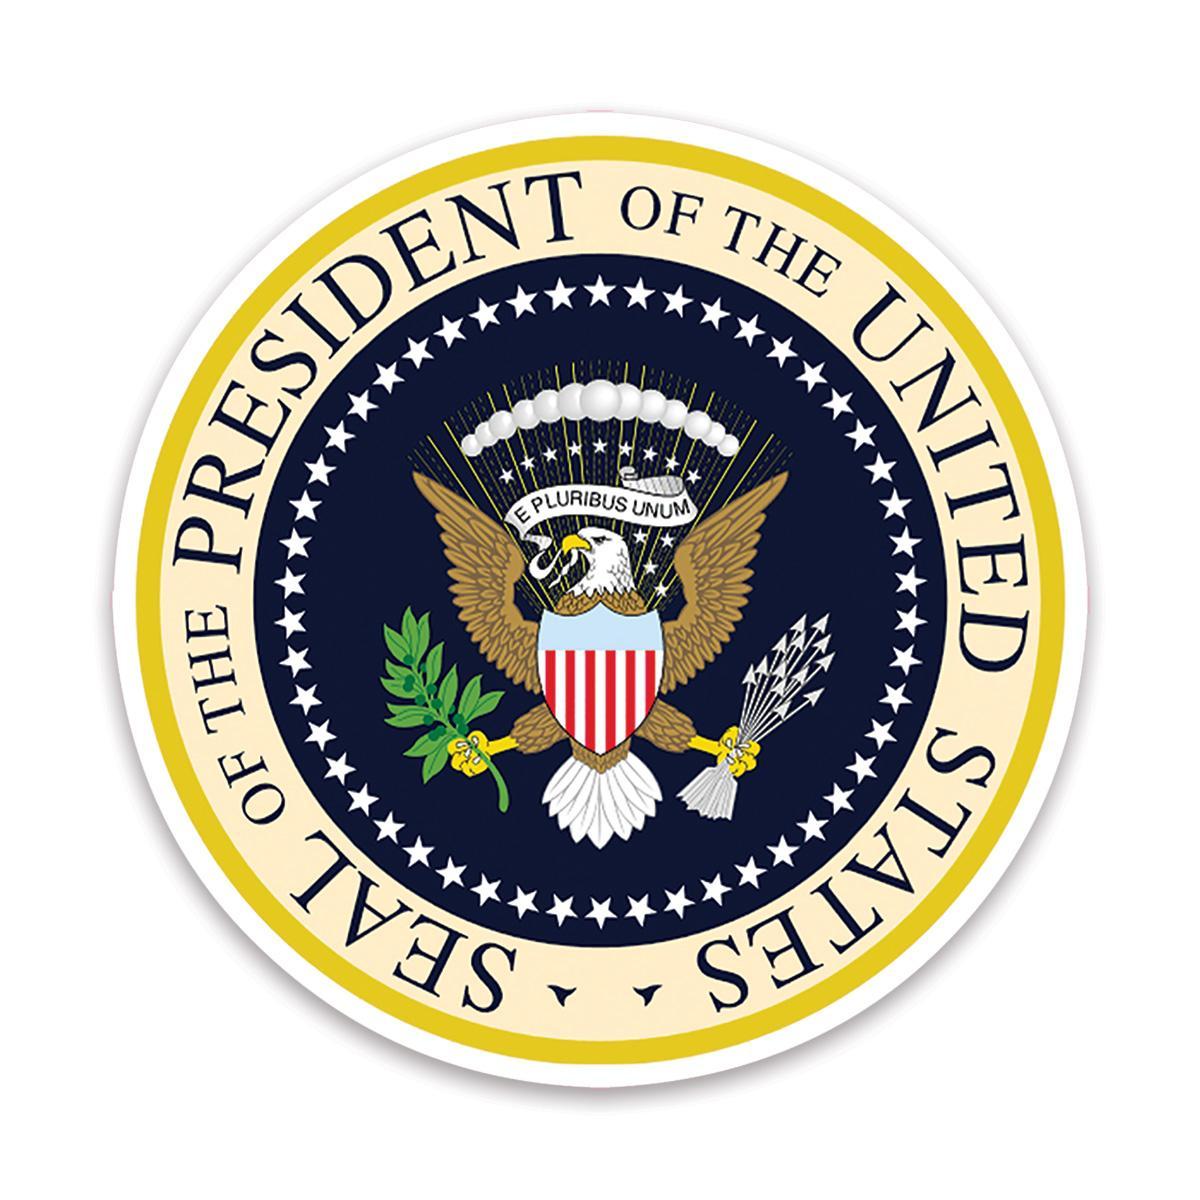 Presidential Seal : Gift Sticker American Patriot Trump USA United States